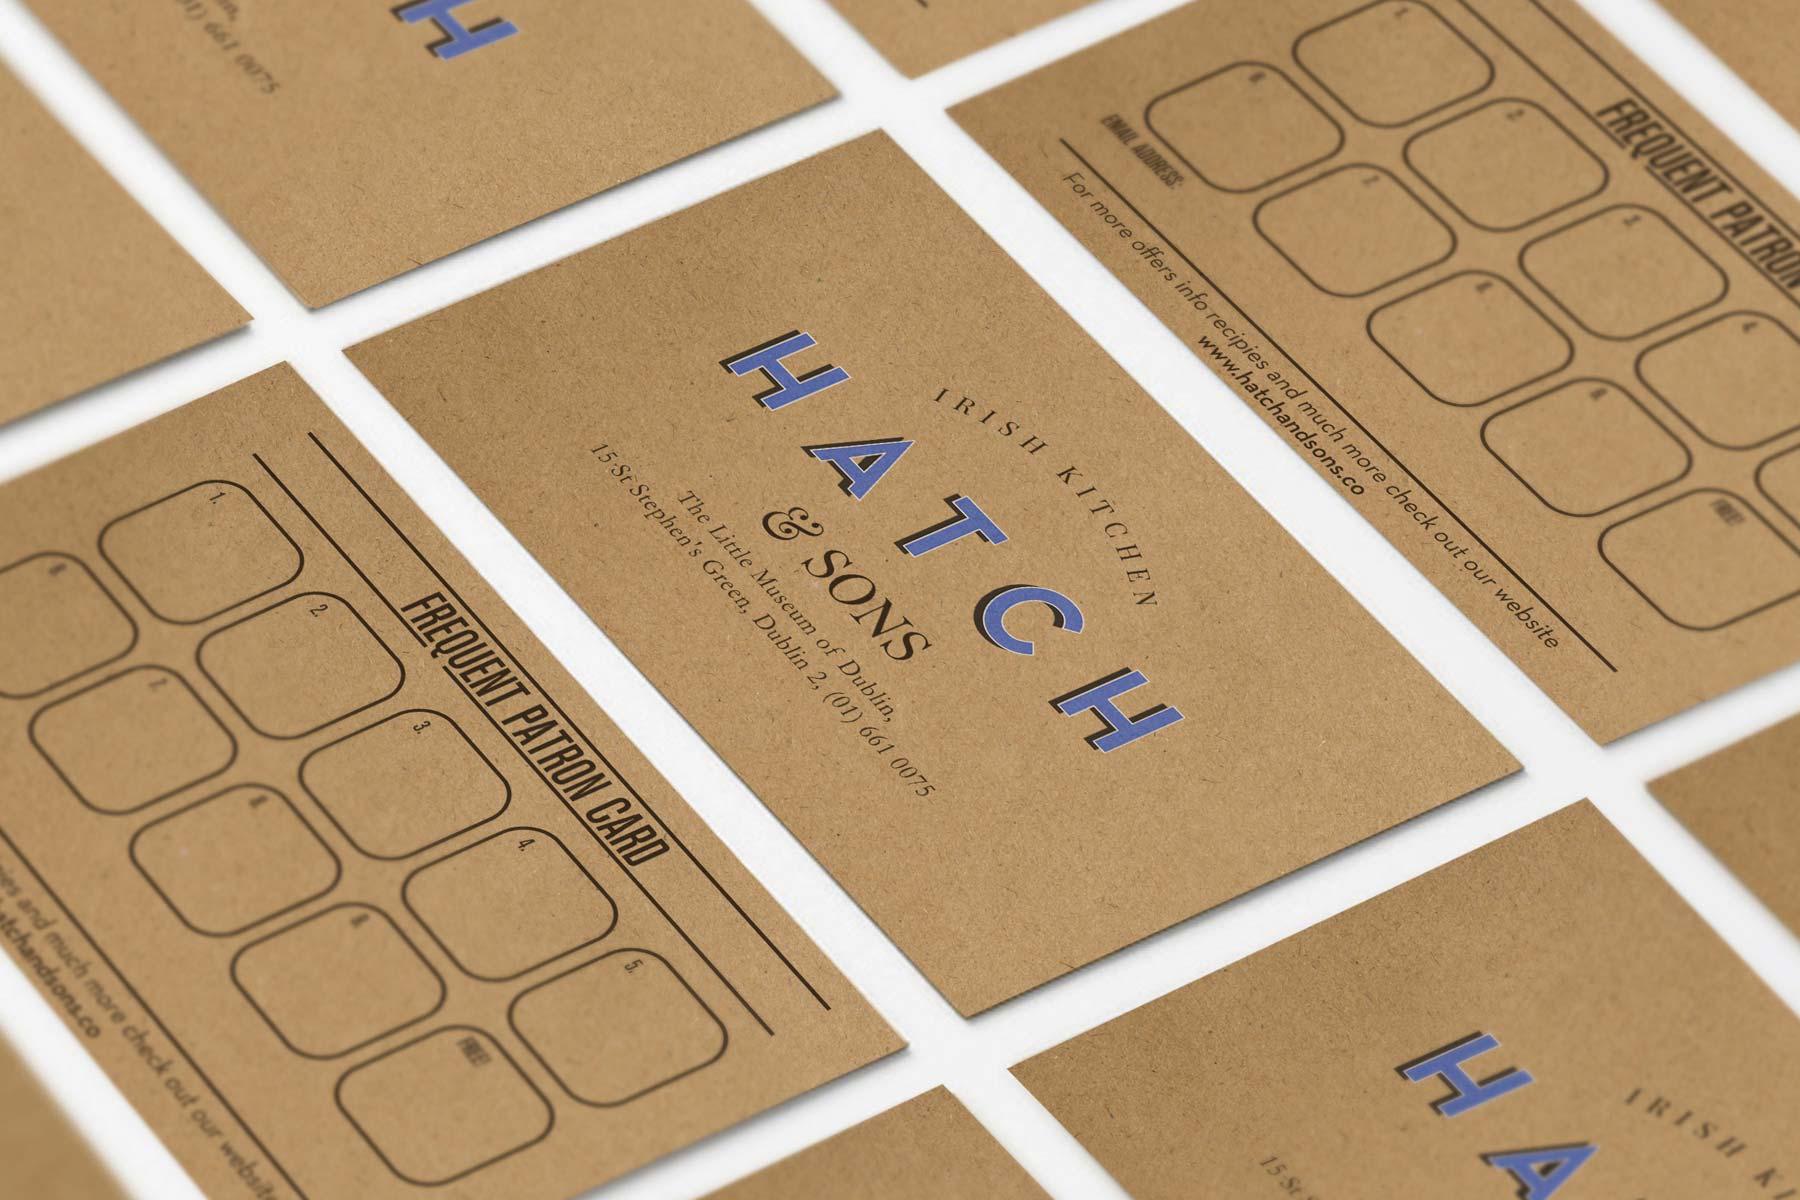 Hatch and Sons  revert design